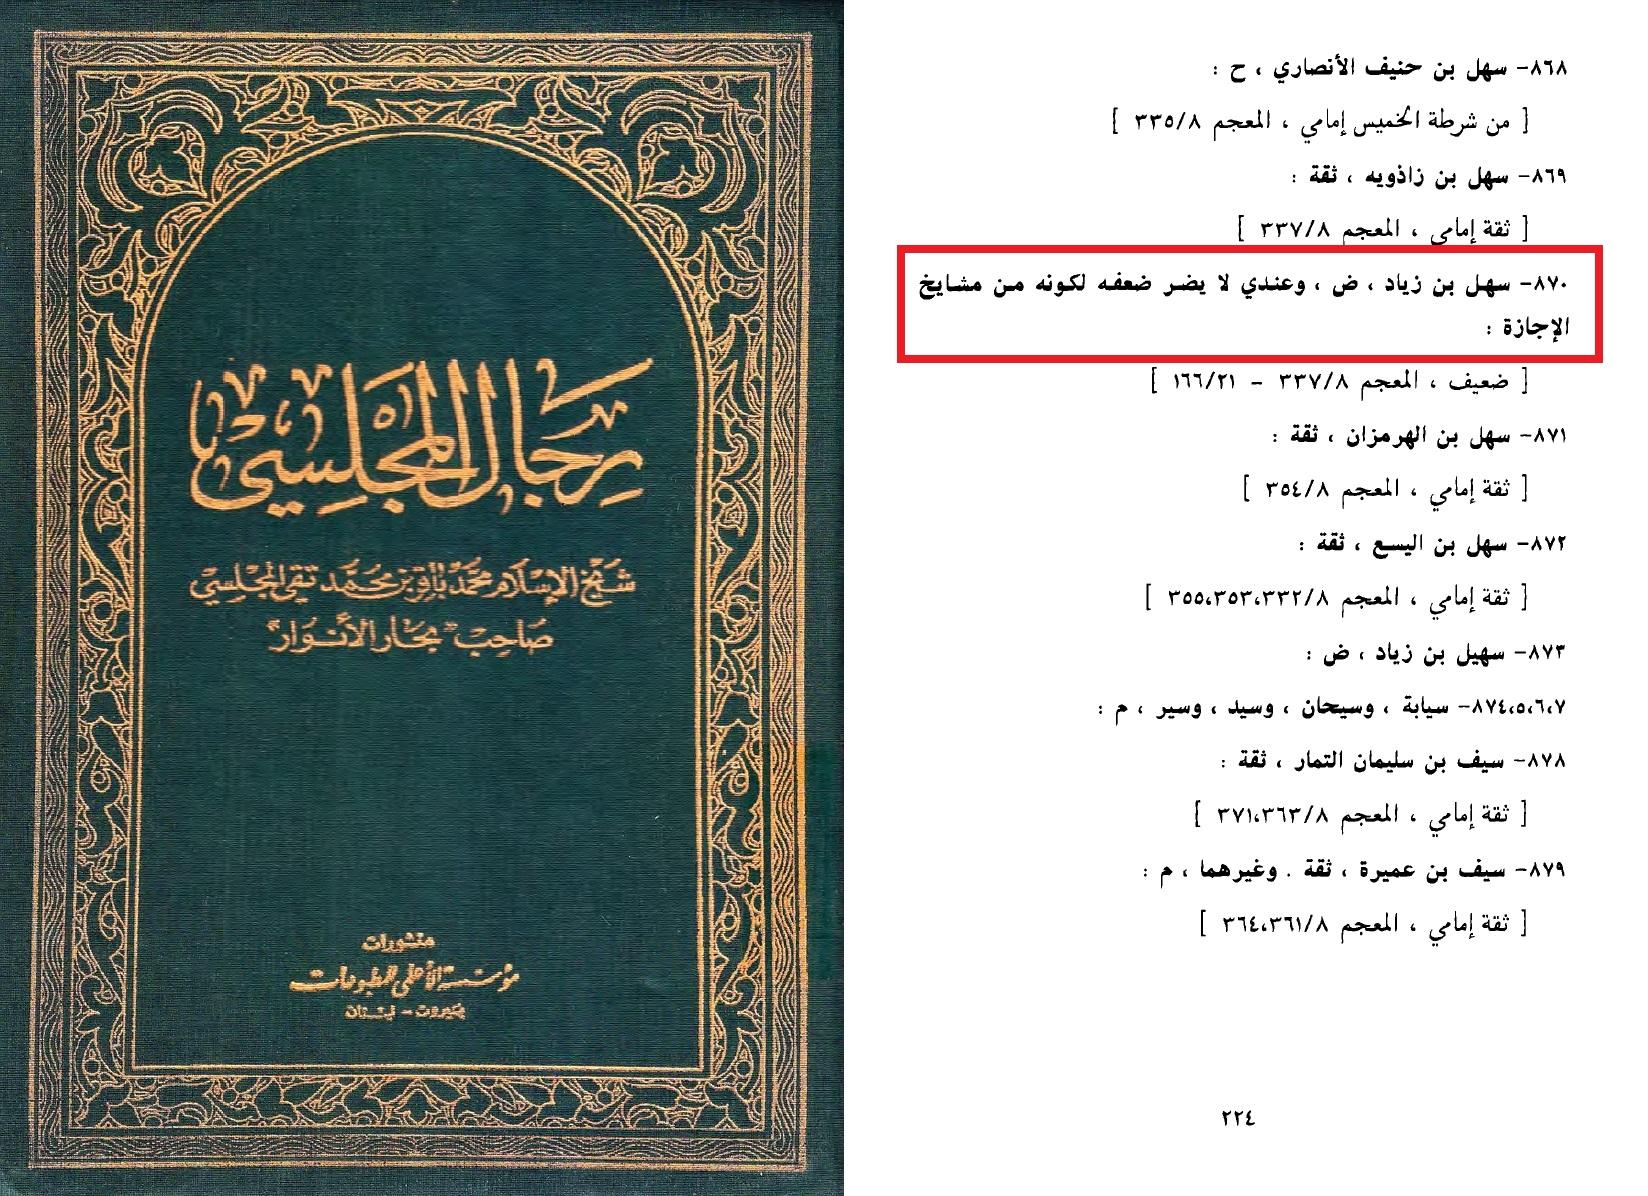 wajizat-dar-3elm-e-rejal-S 224 N 870